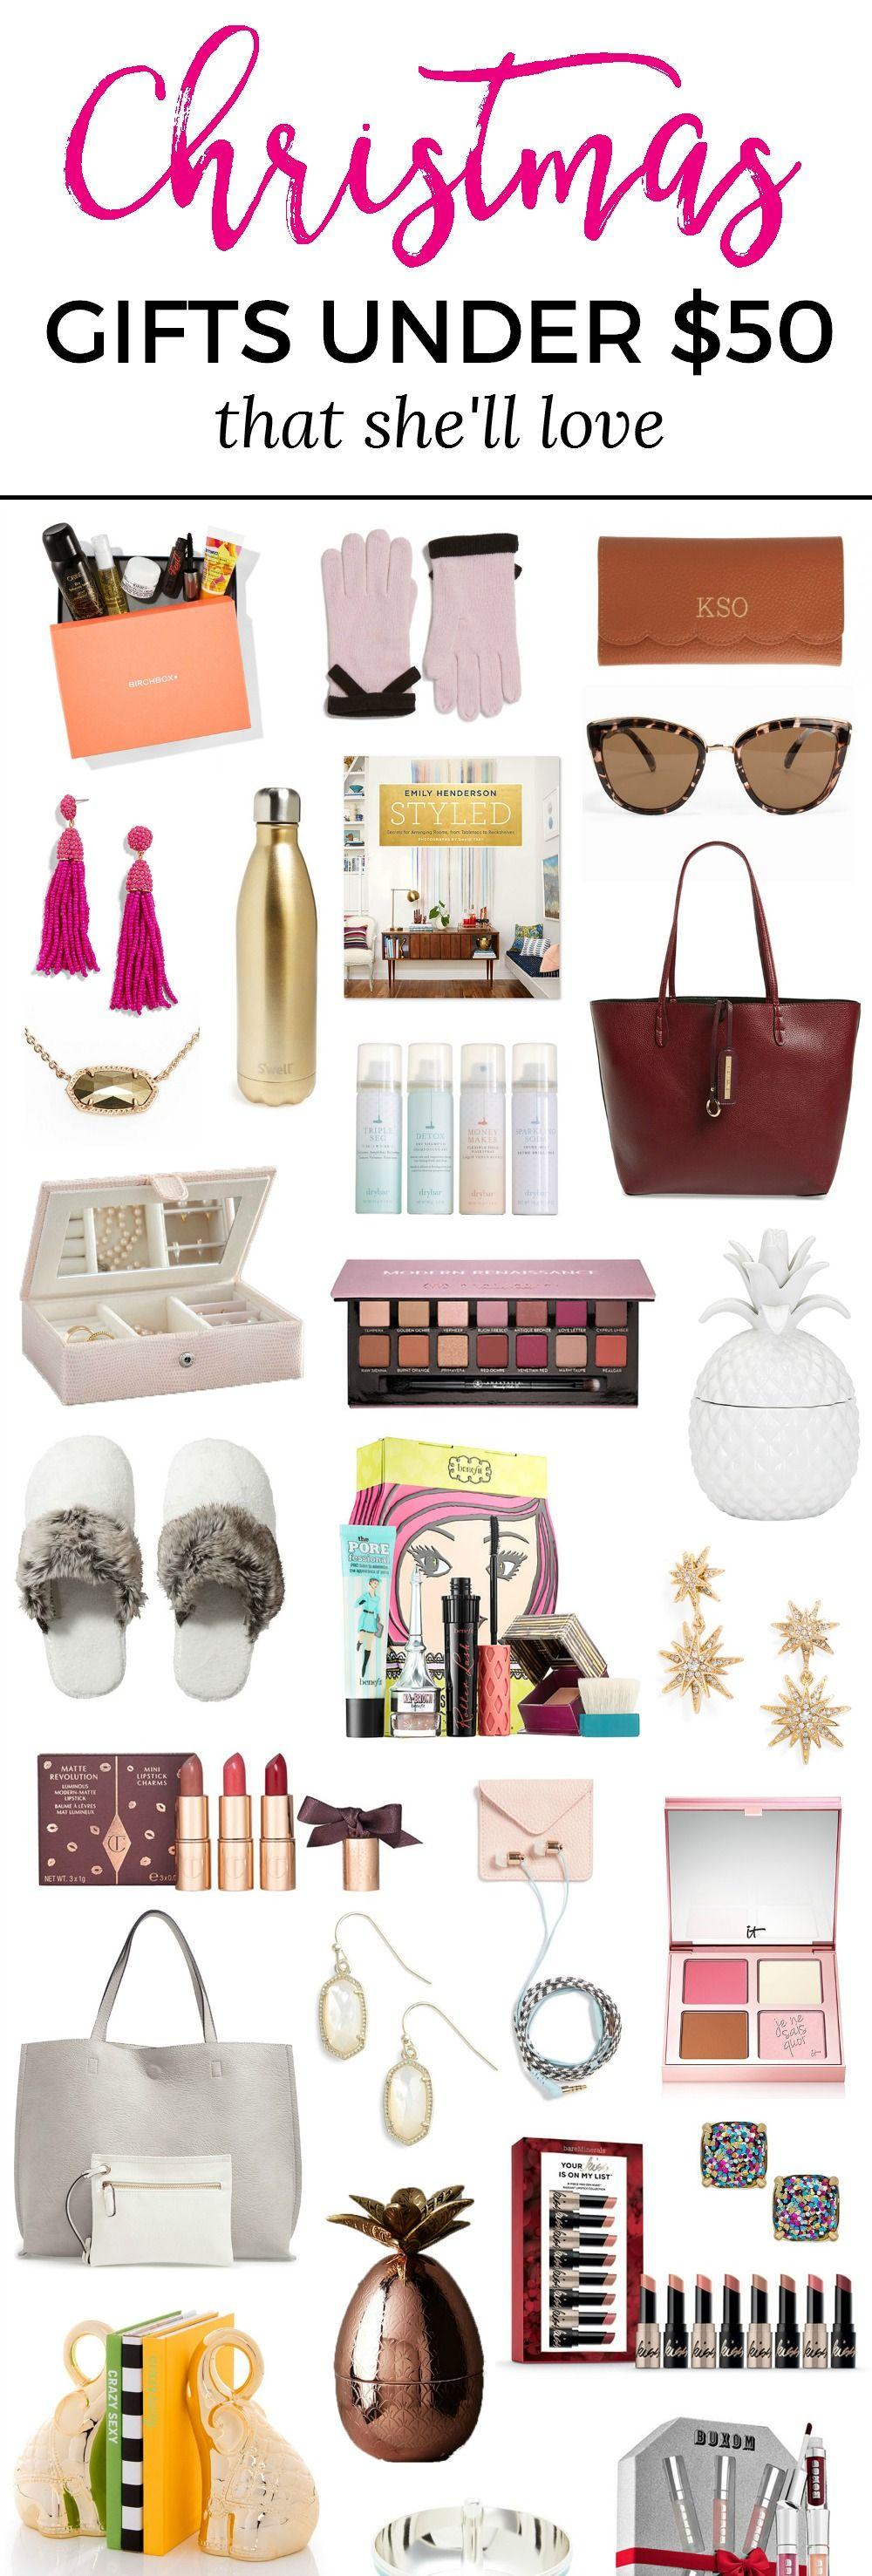 The best christmas gift ideas for women under 50 via